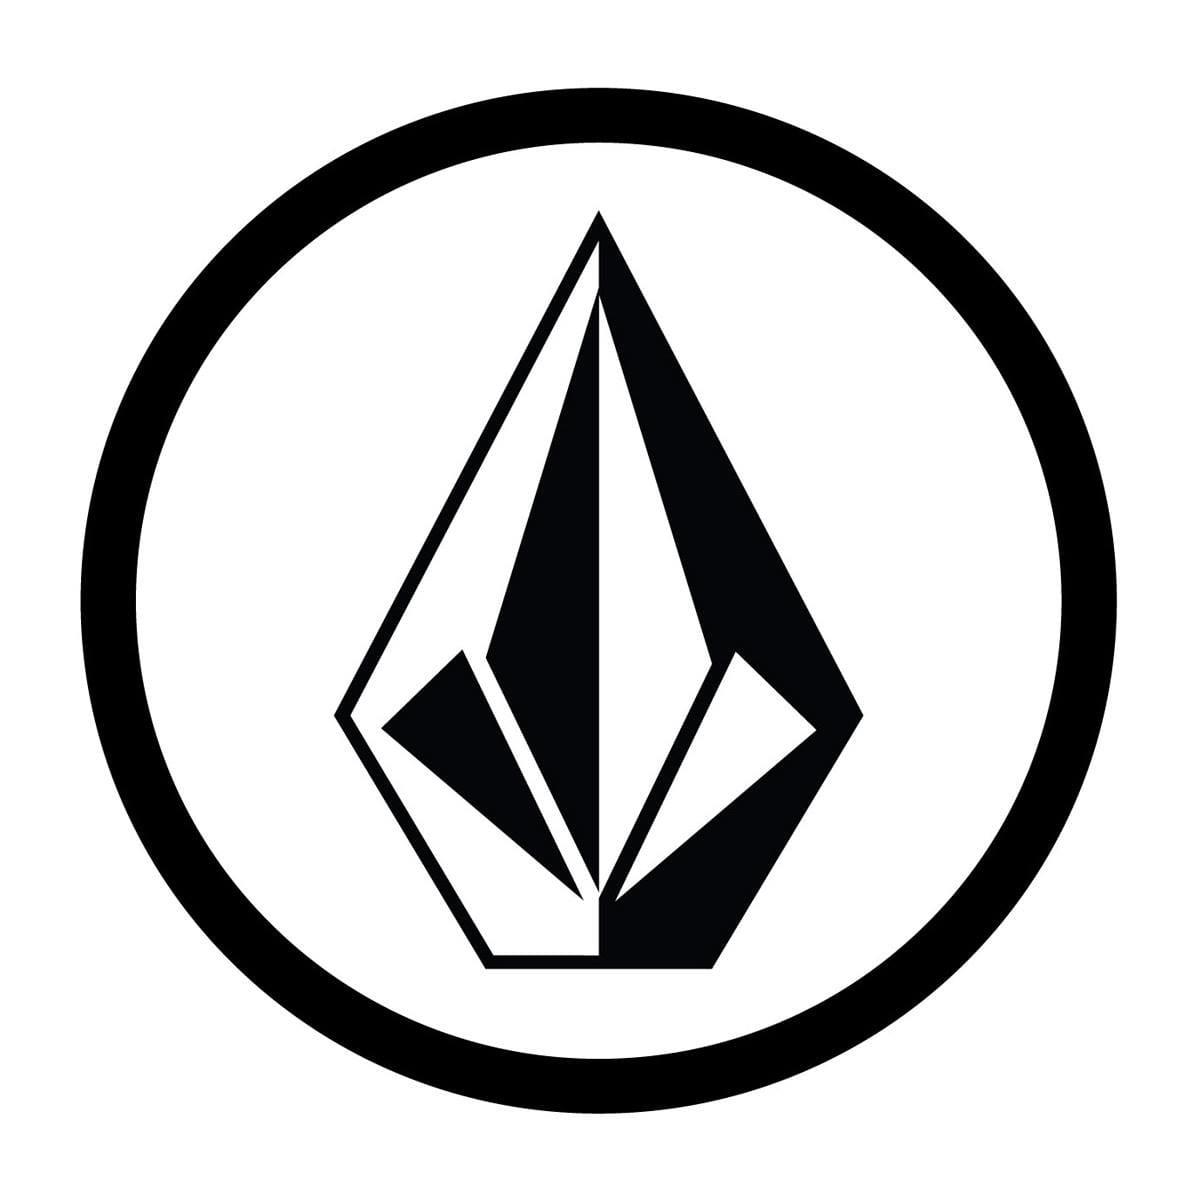 Volcom-facebook-logo